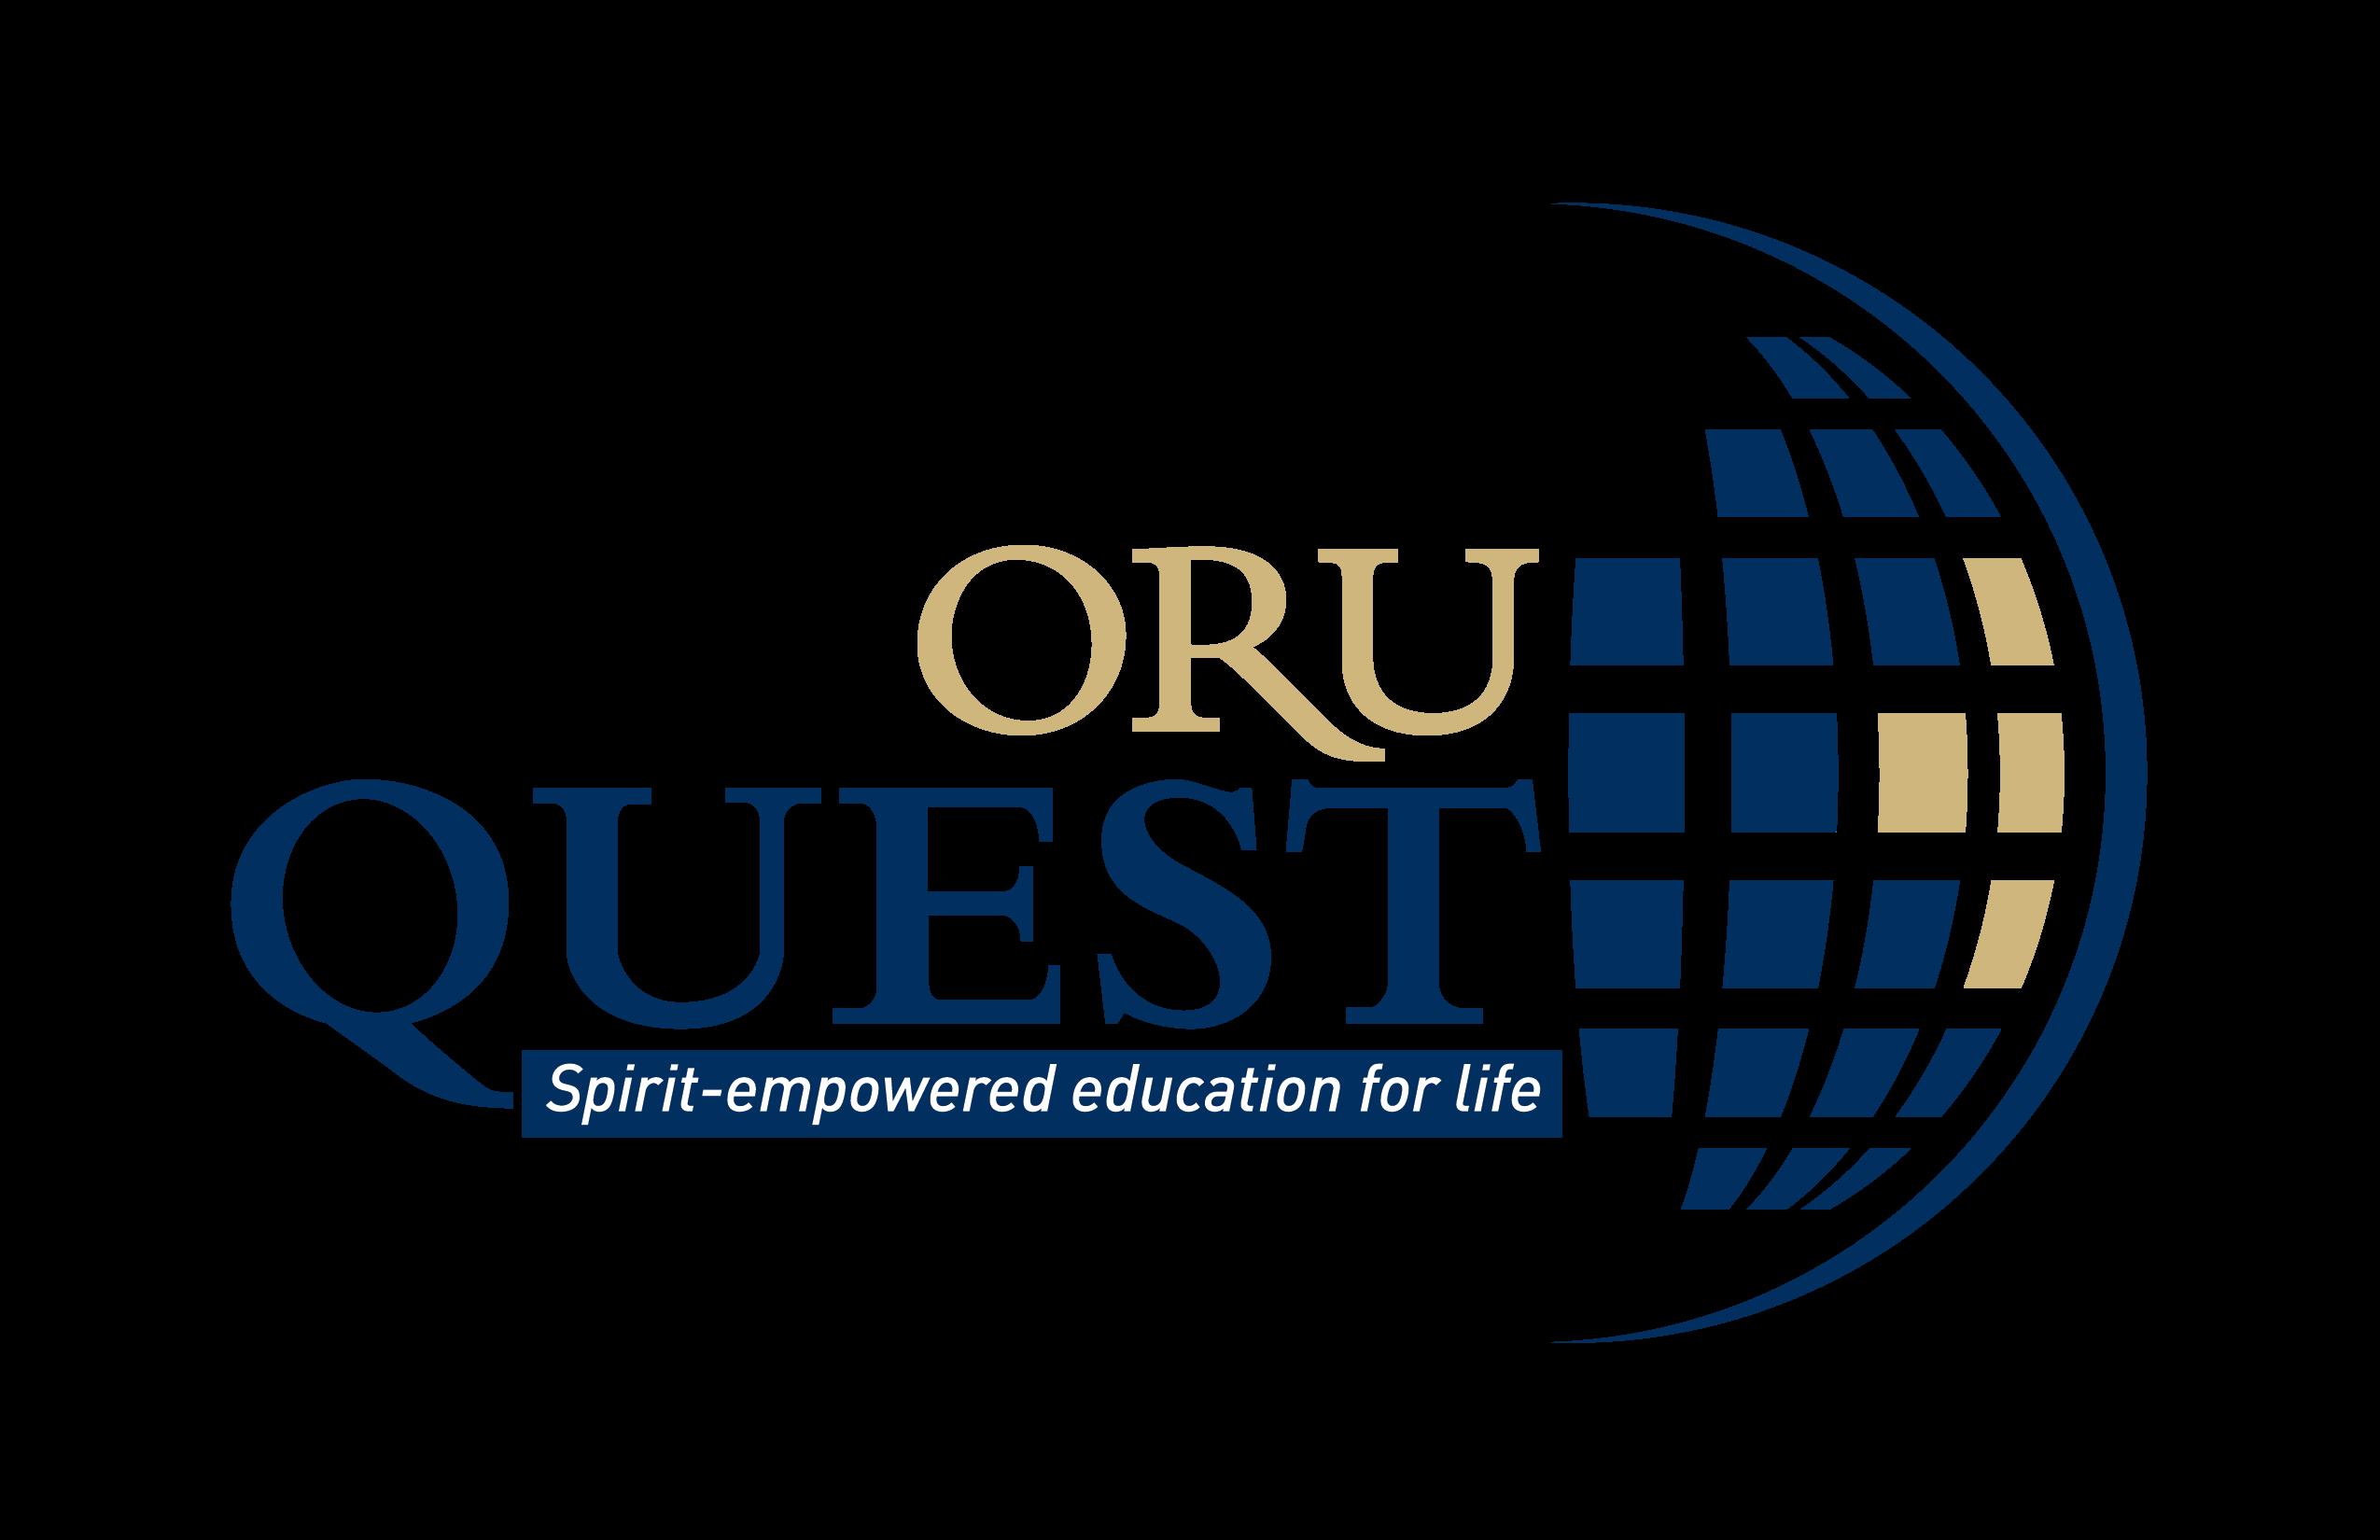 ORU Quest Certificate Programs